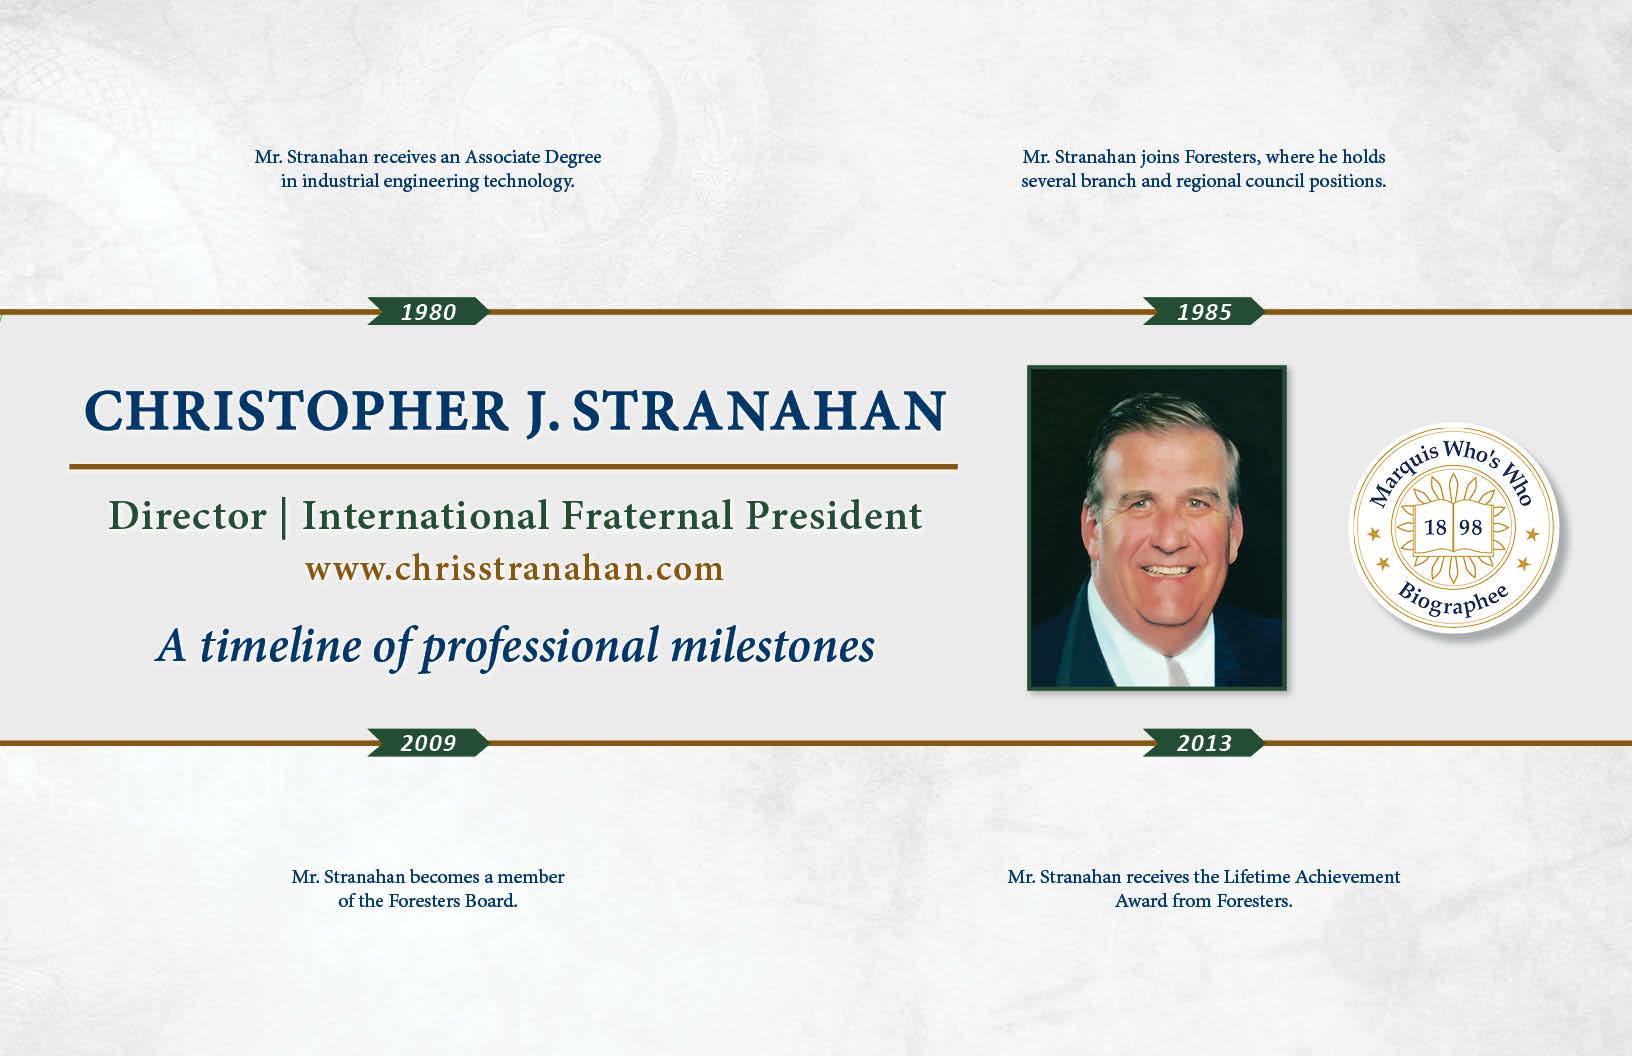 Christopher Stranahan Professional Milestones